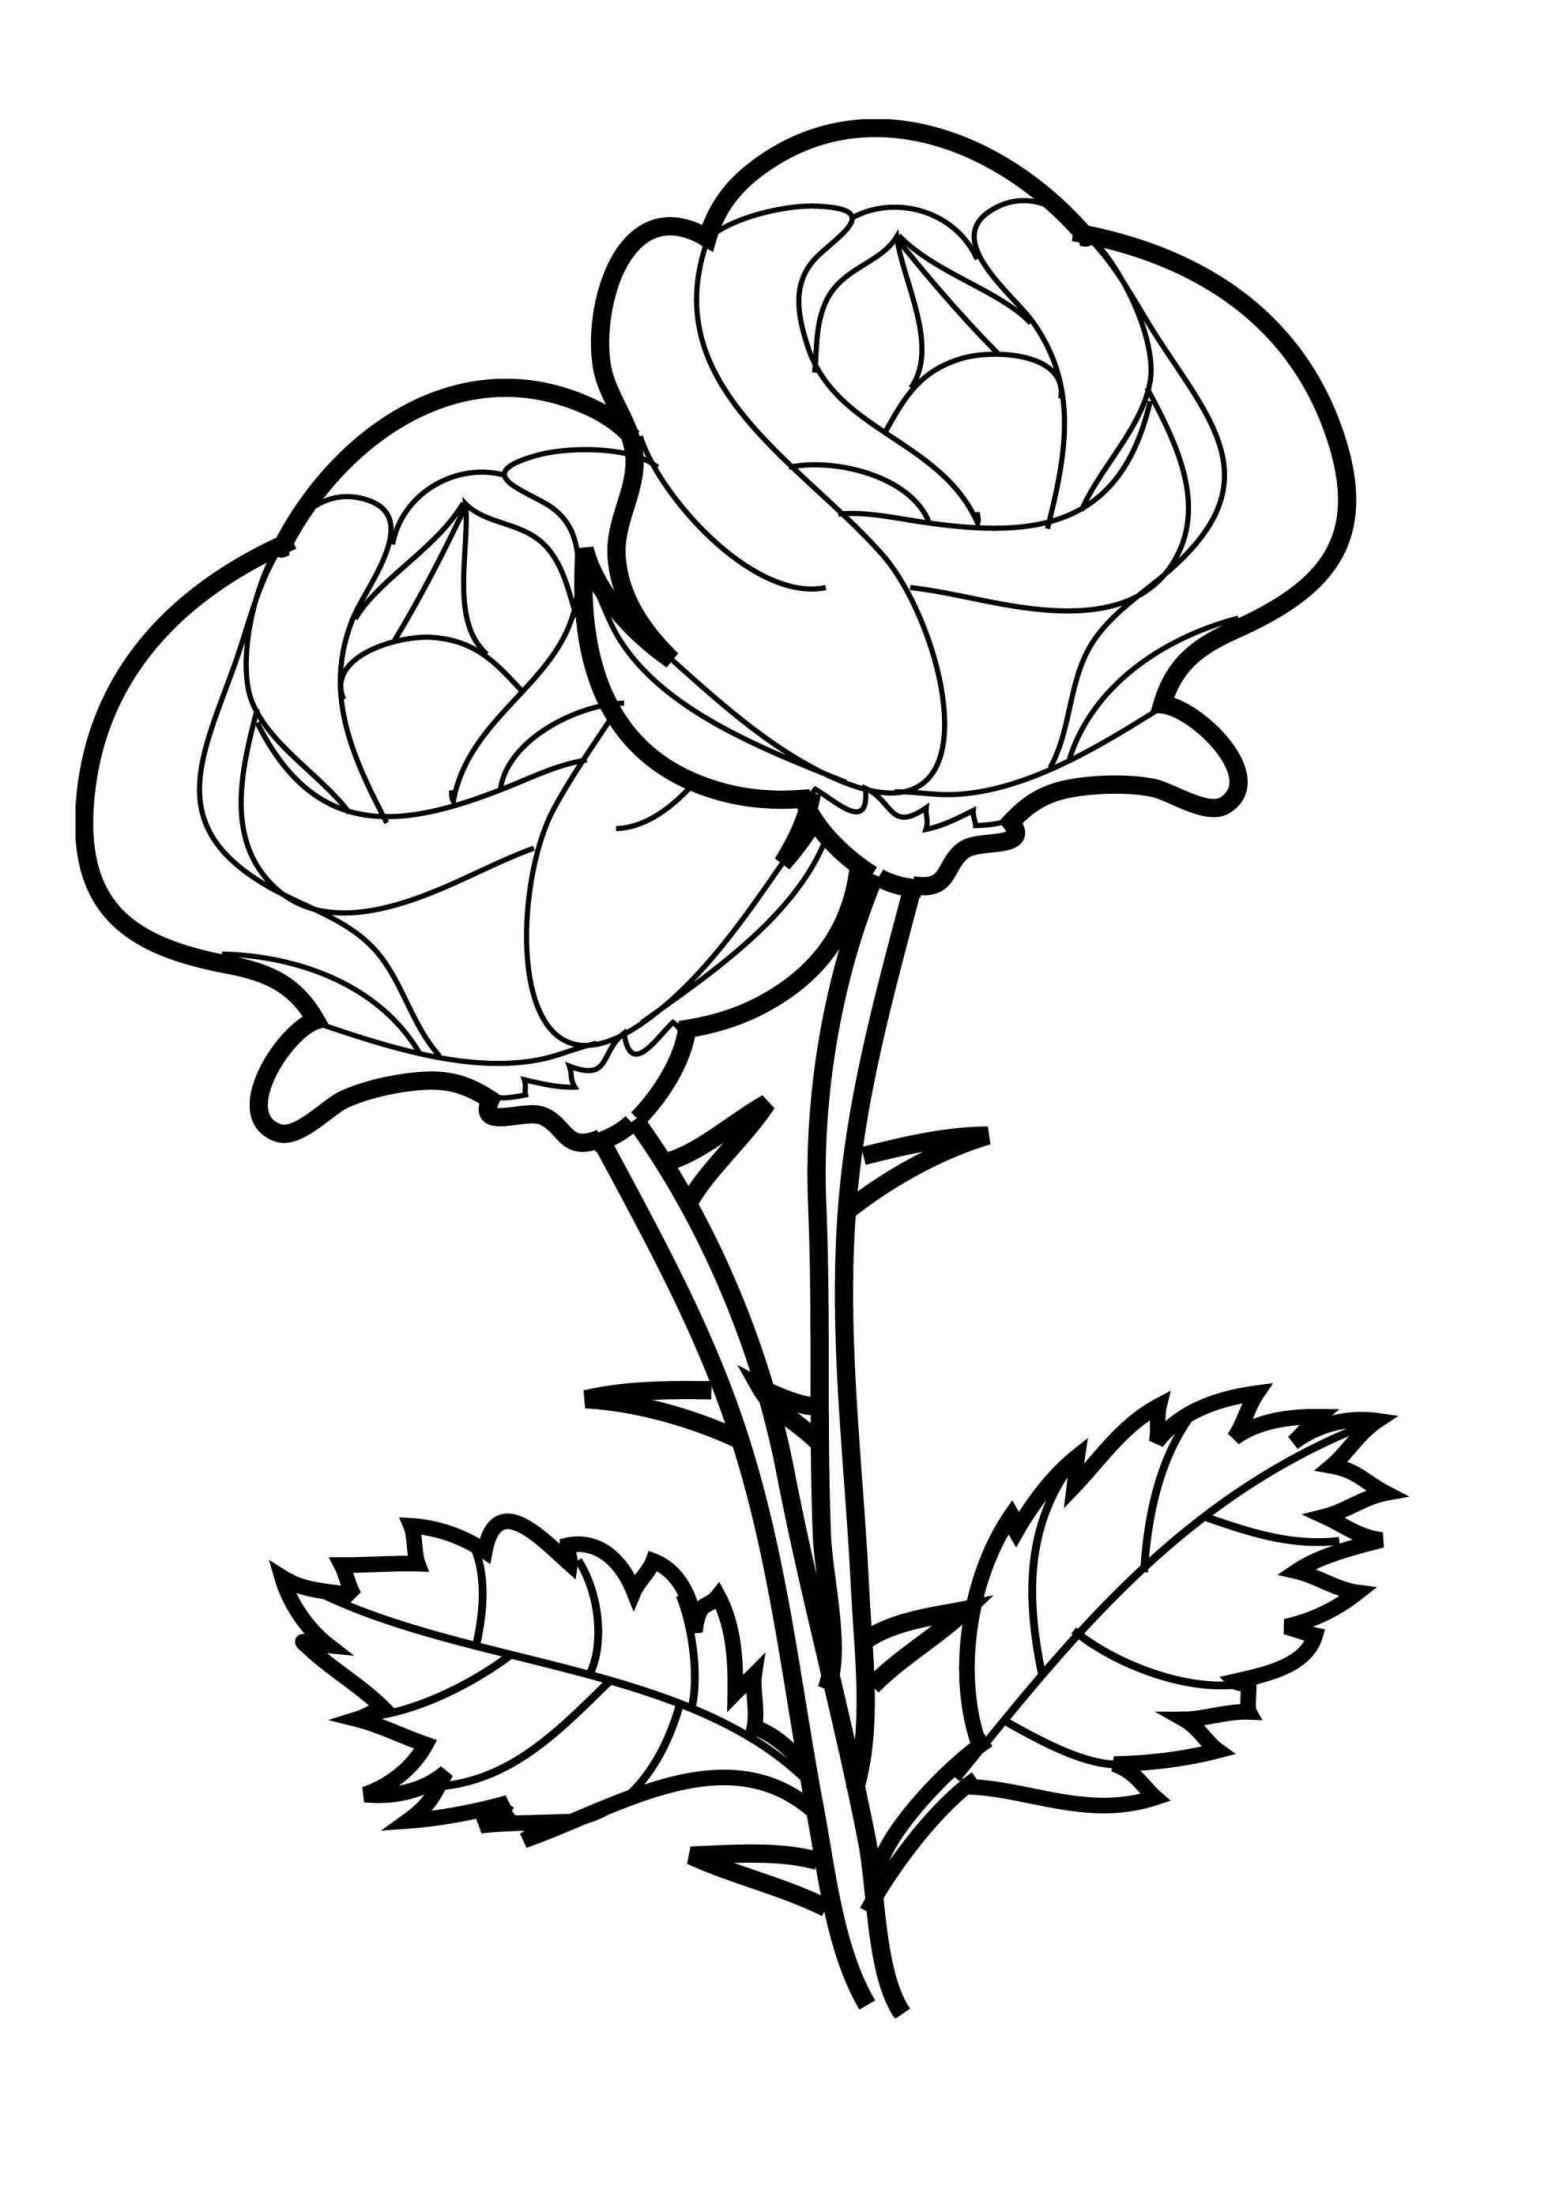 1548x2189 Heart Rose Pictures To Draw Urldircom